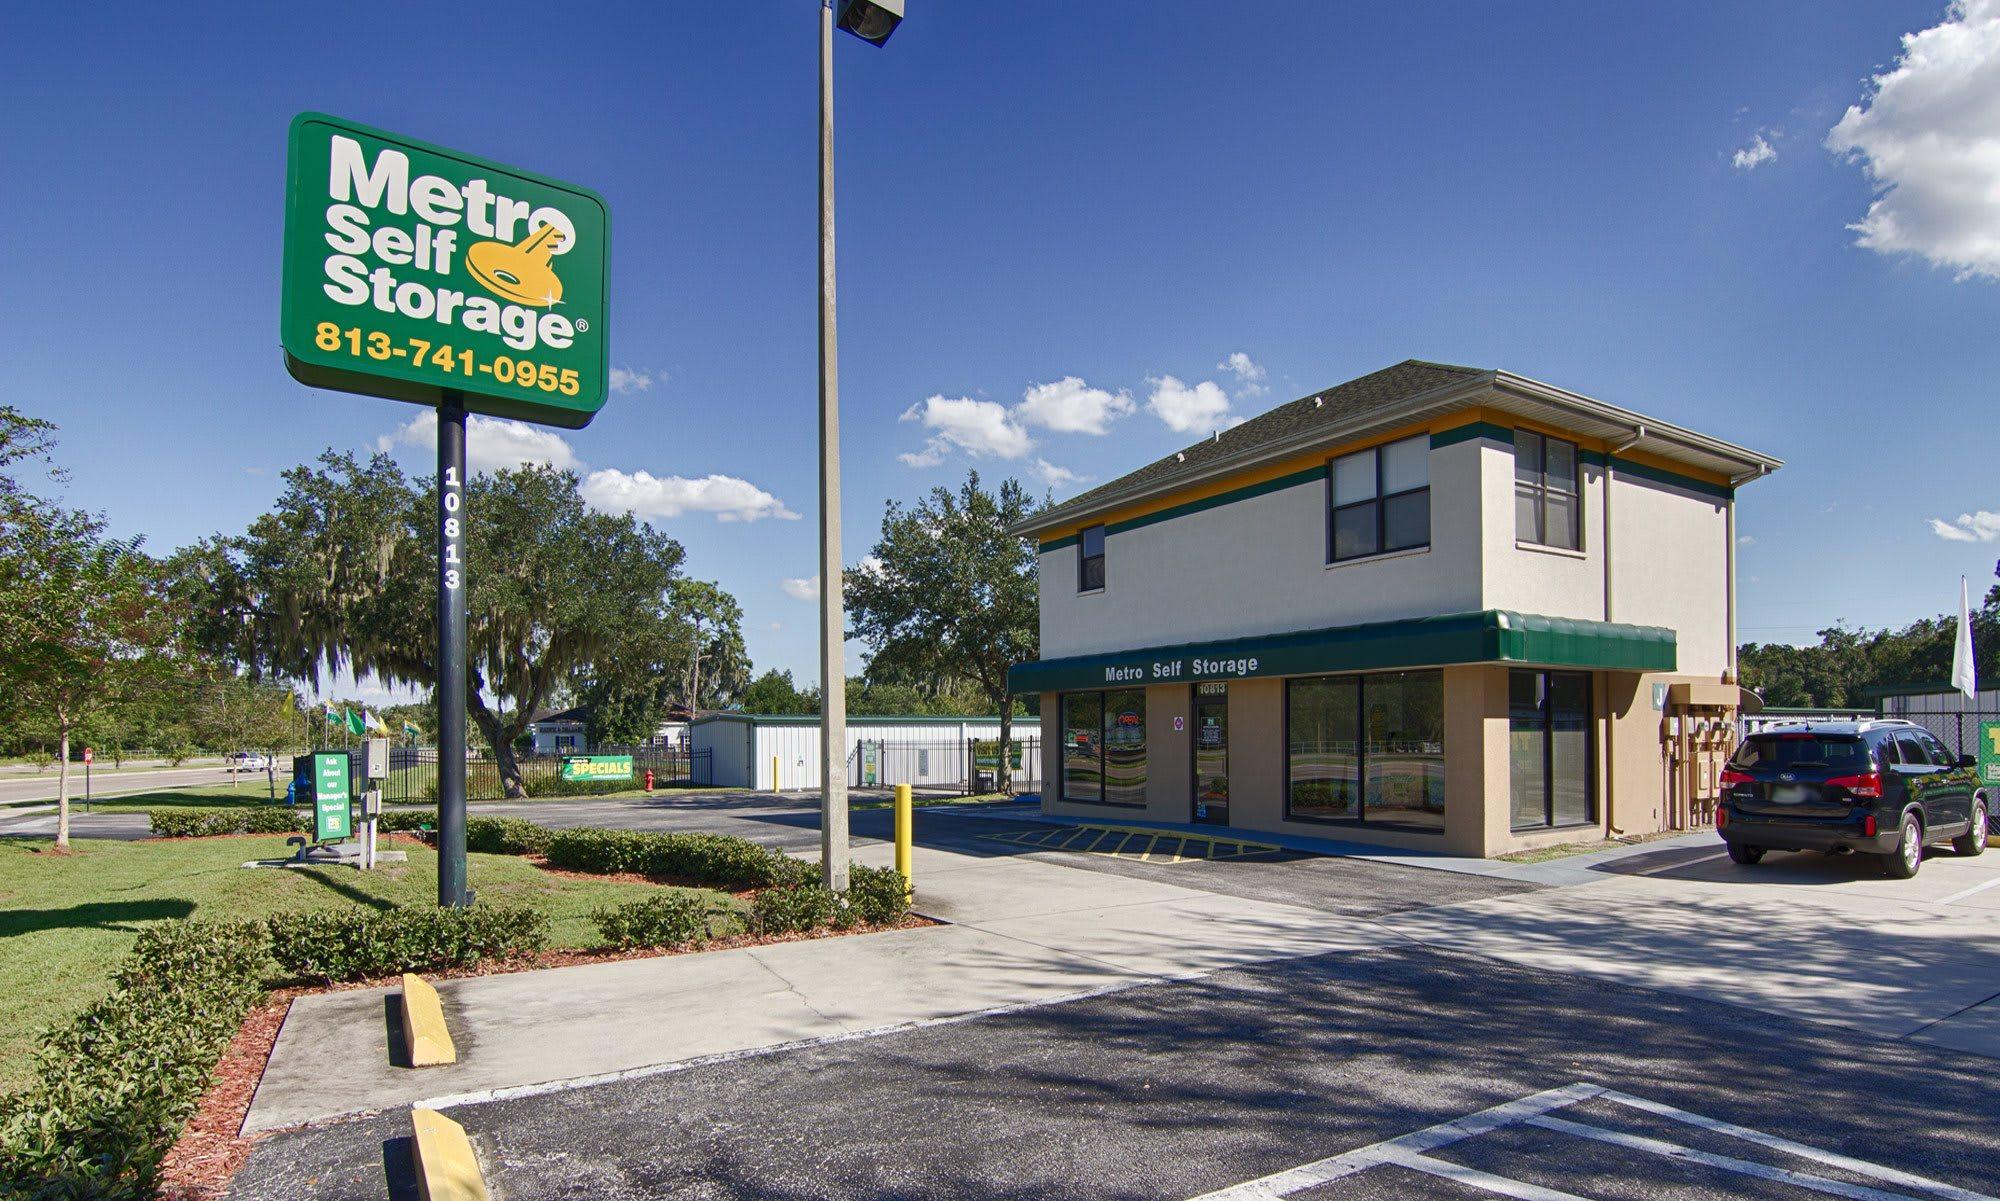 Metro Self Storage in Riverview, FL